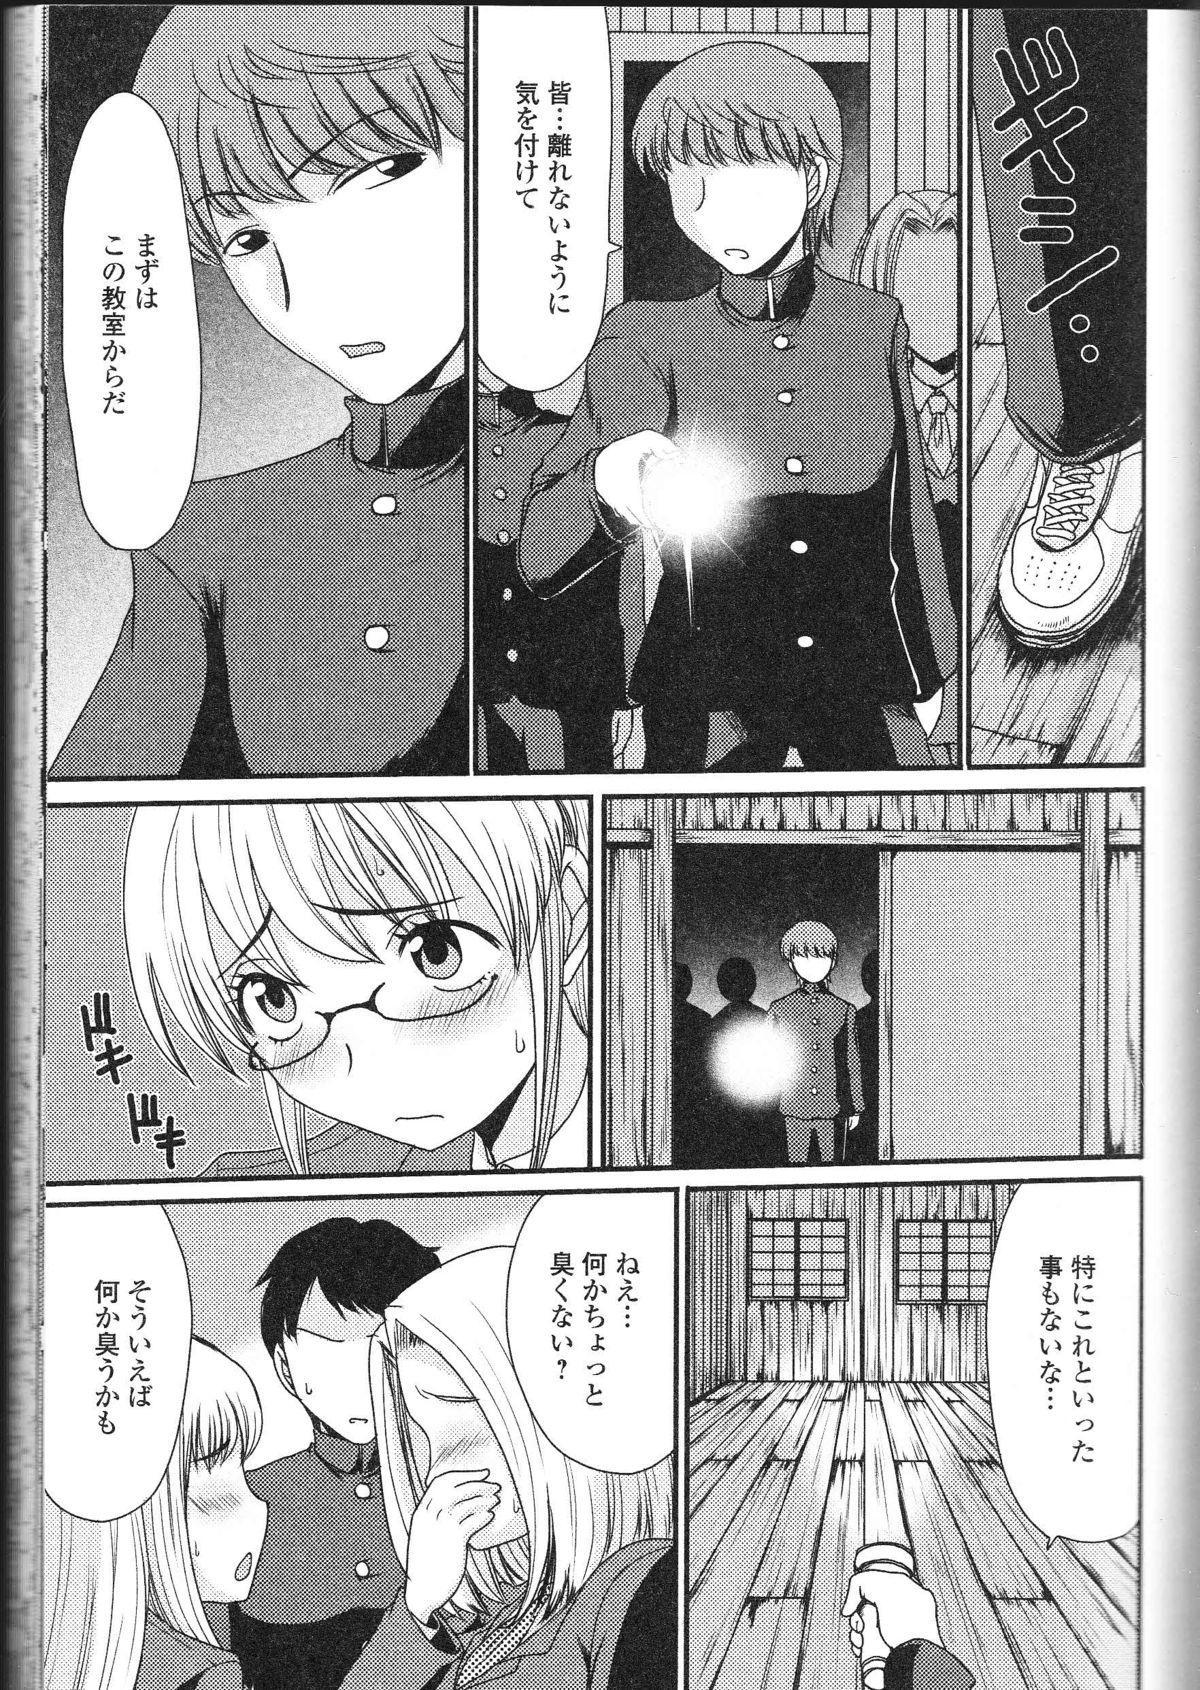 Nozoite wa Ikenai 9 - Do Not Peep! 9 111